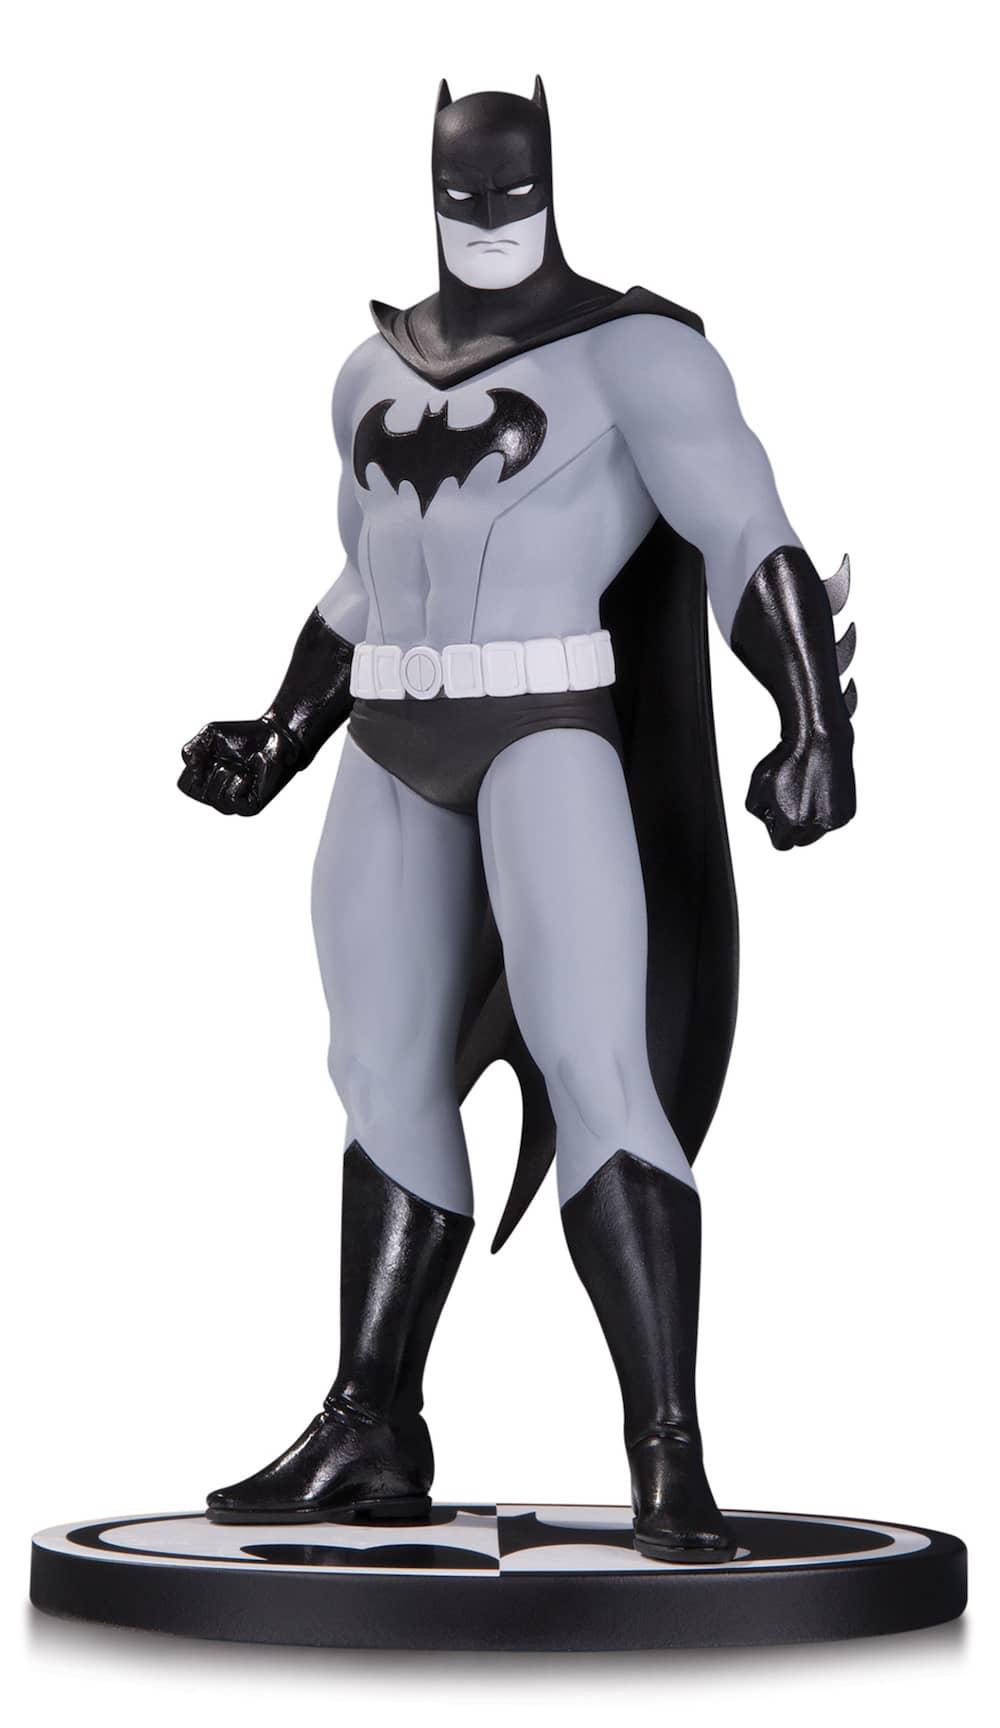 BATMAN BY AMANDA CONNER B&W ESTATUA 19 CM BATMAN BLACK & WHITE UNIVERSO DC